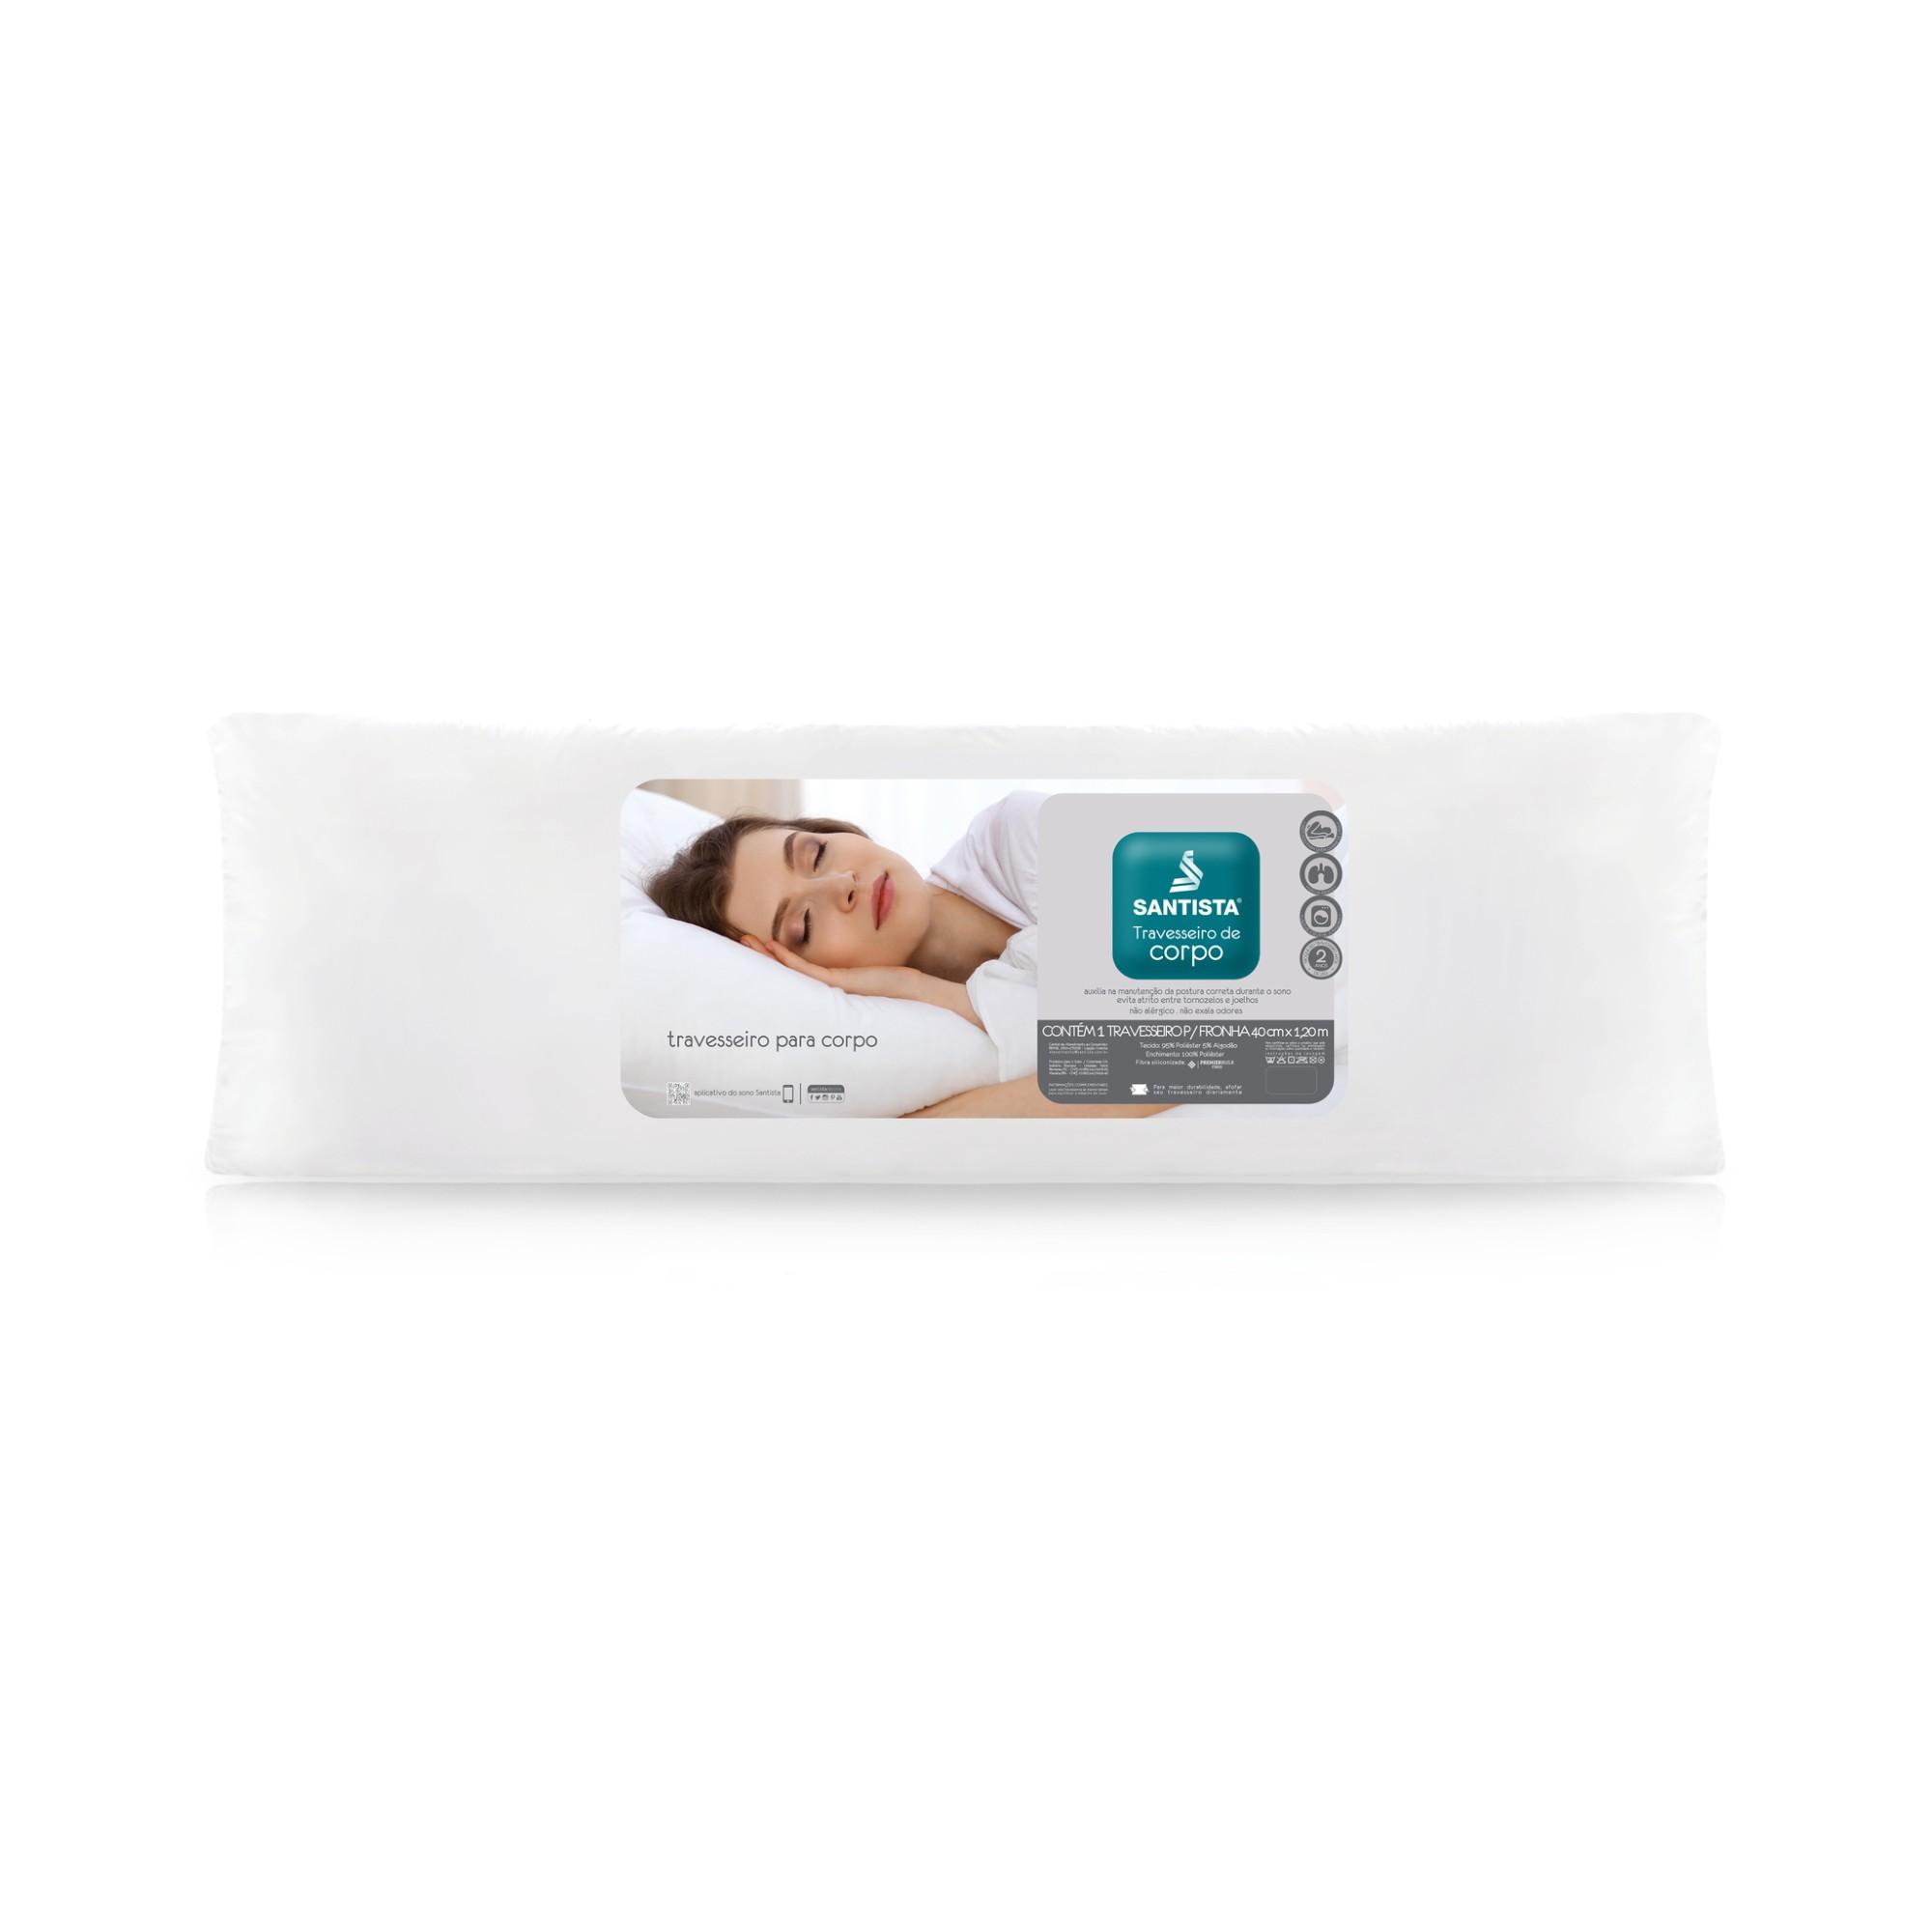 Travesseiro de Corpo Santista Premier 38x120 cm Sem Fronha - Branco